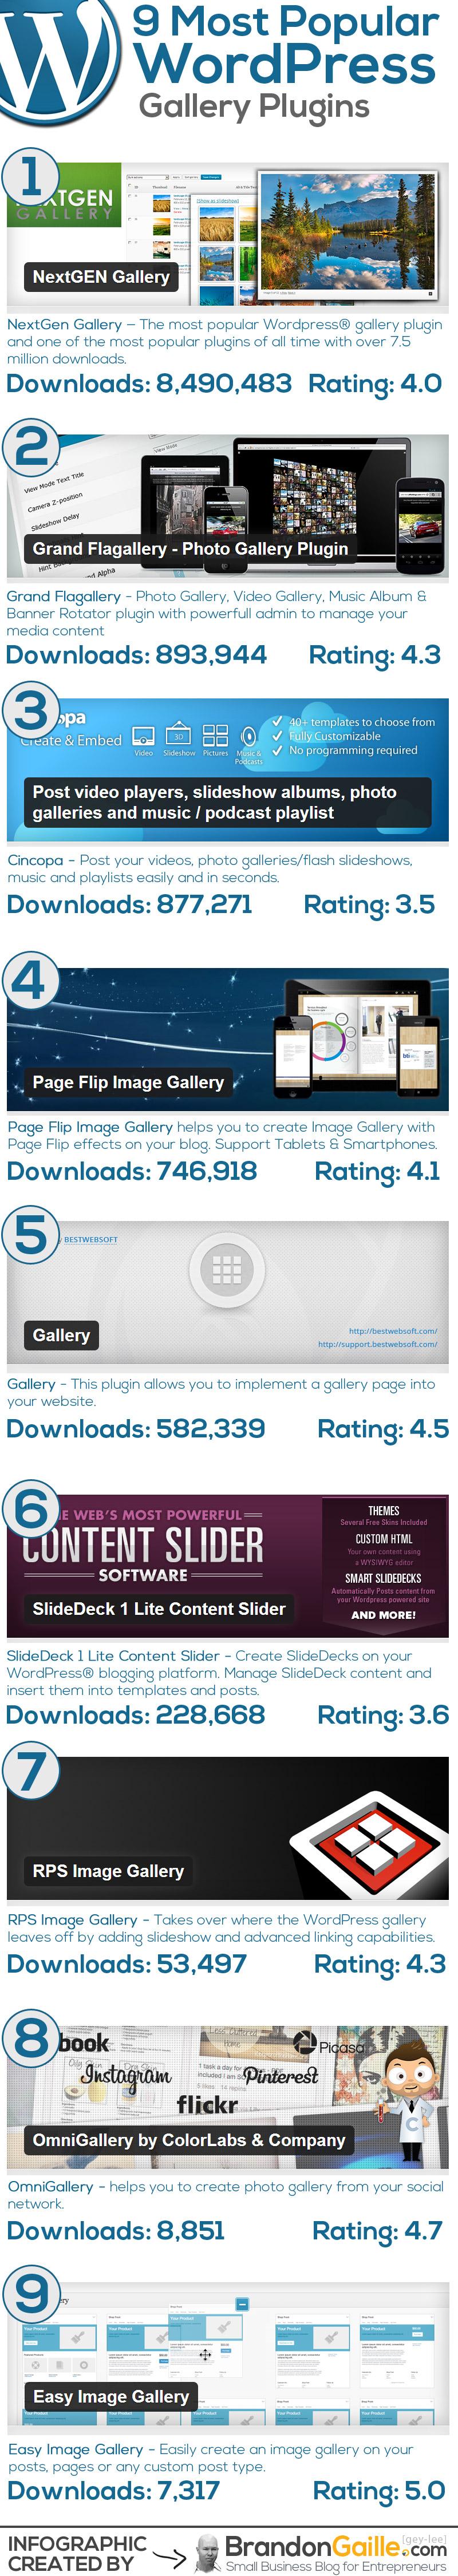 9-most-popular-wordpress-gallery-plugins_525c530fd5843